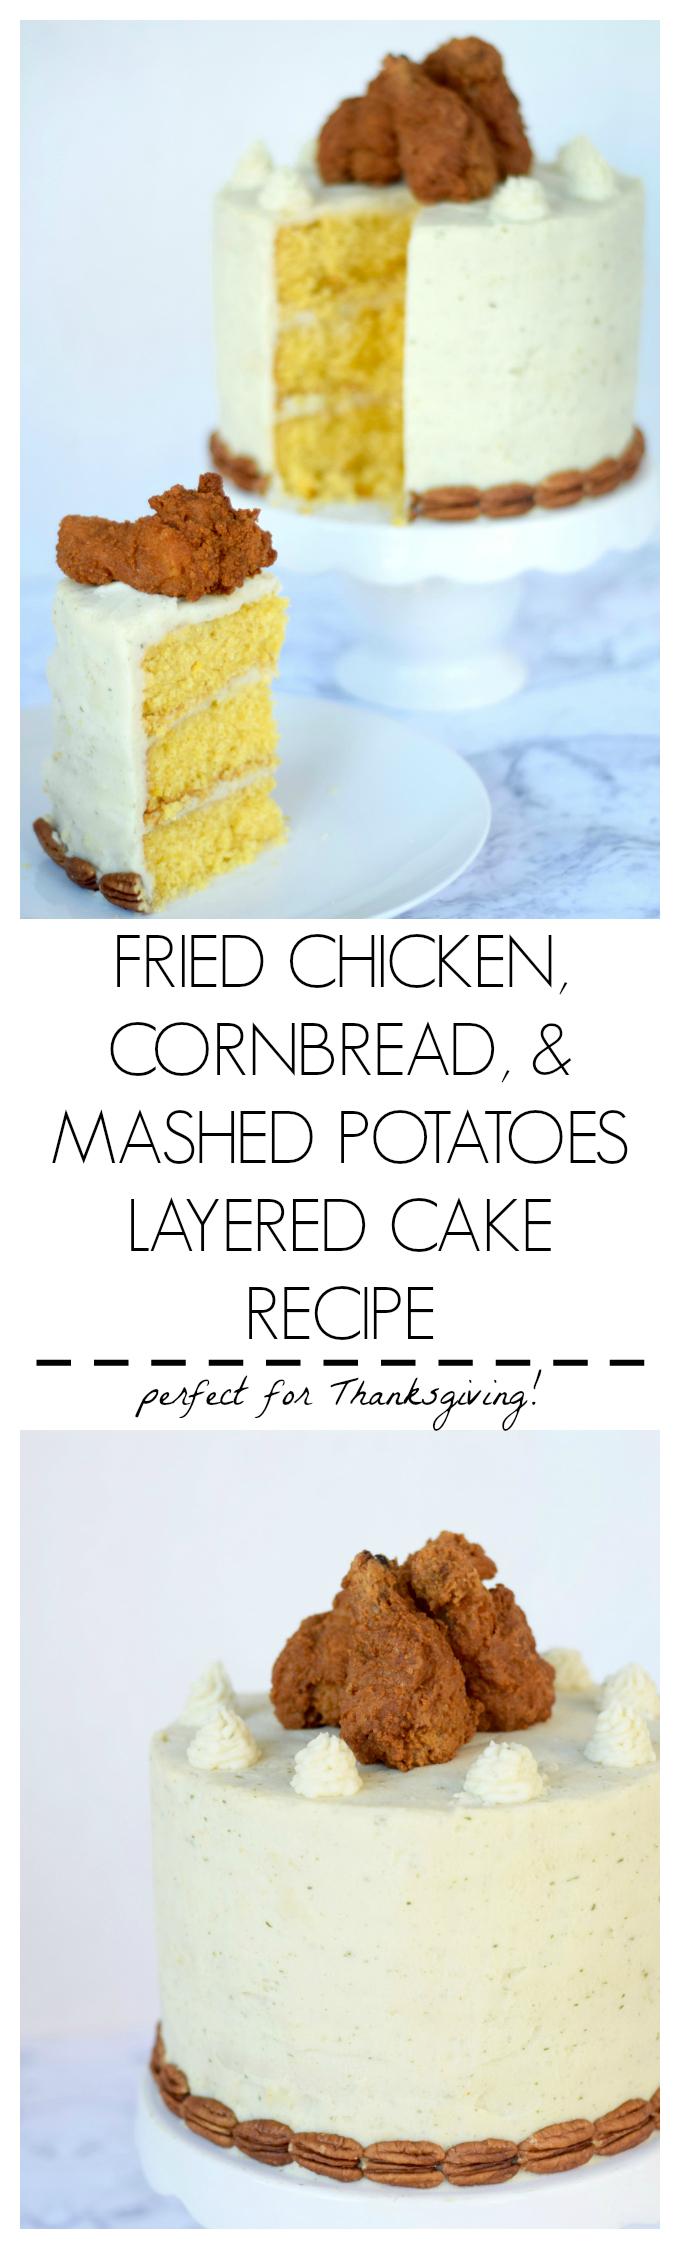 Fried Chicken Cornbread & Mashed Potatoes Layered Cake Recipe